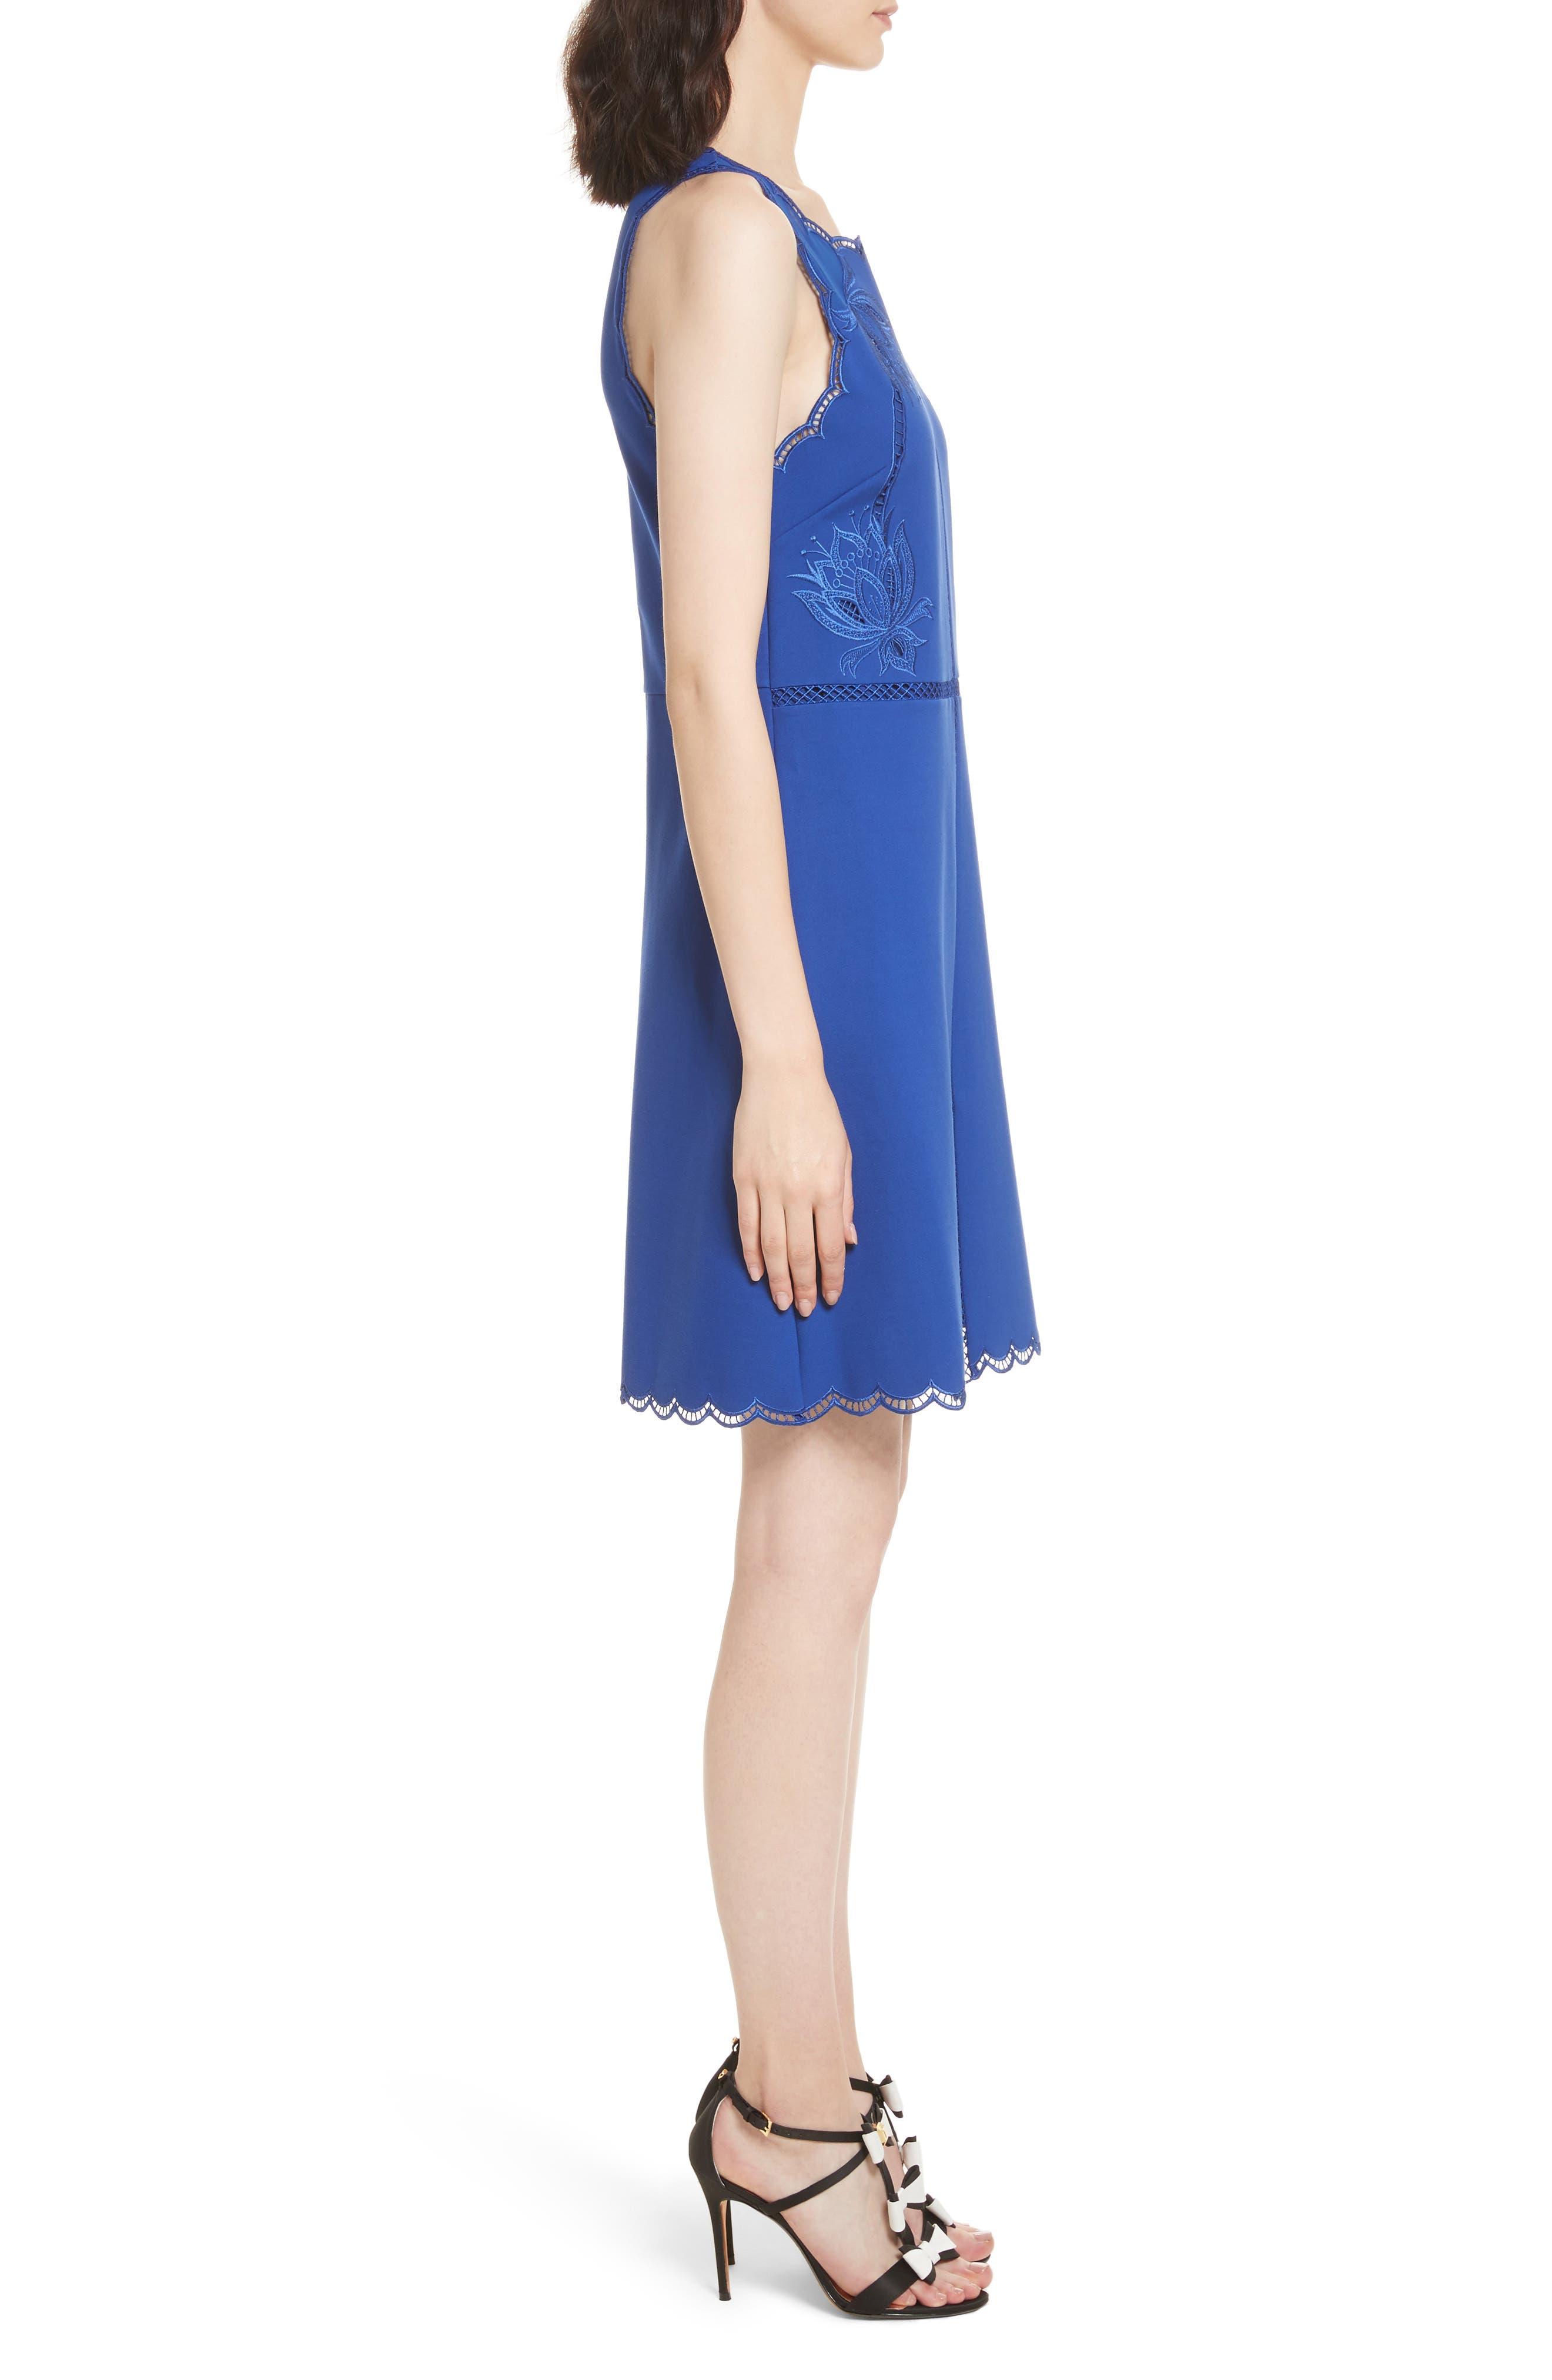 Codi Embroidered Scallop A-Line Dress,                             Alternate thumbnail 3, color,                             Mid Blue